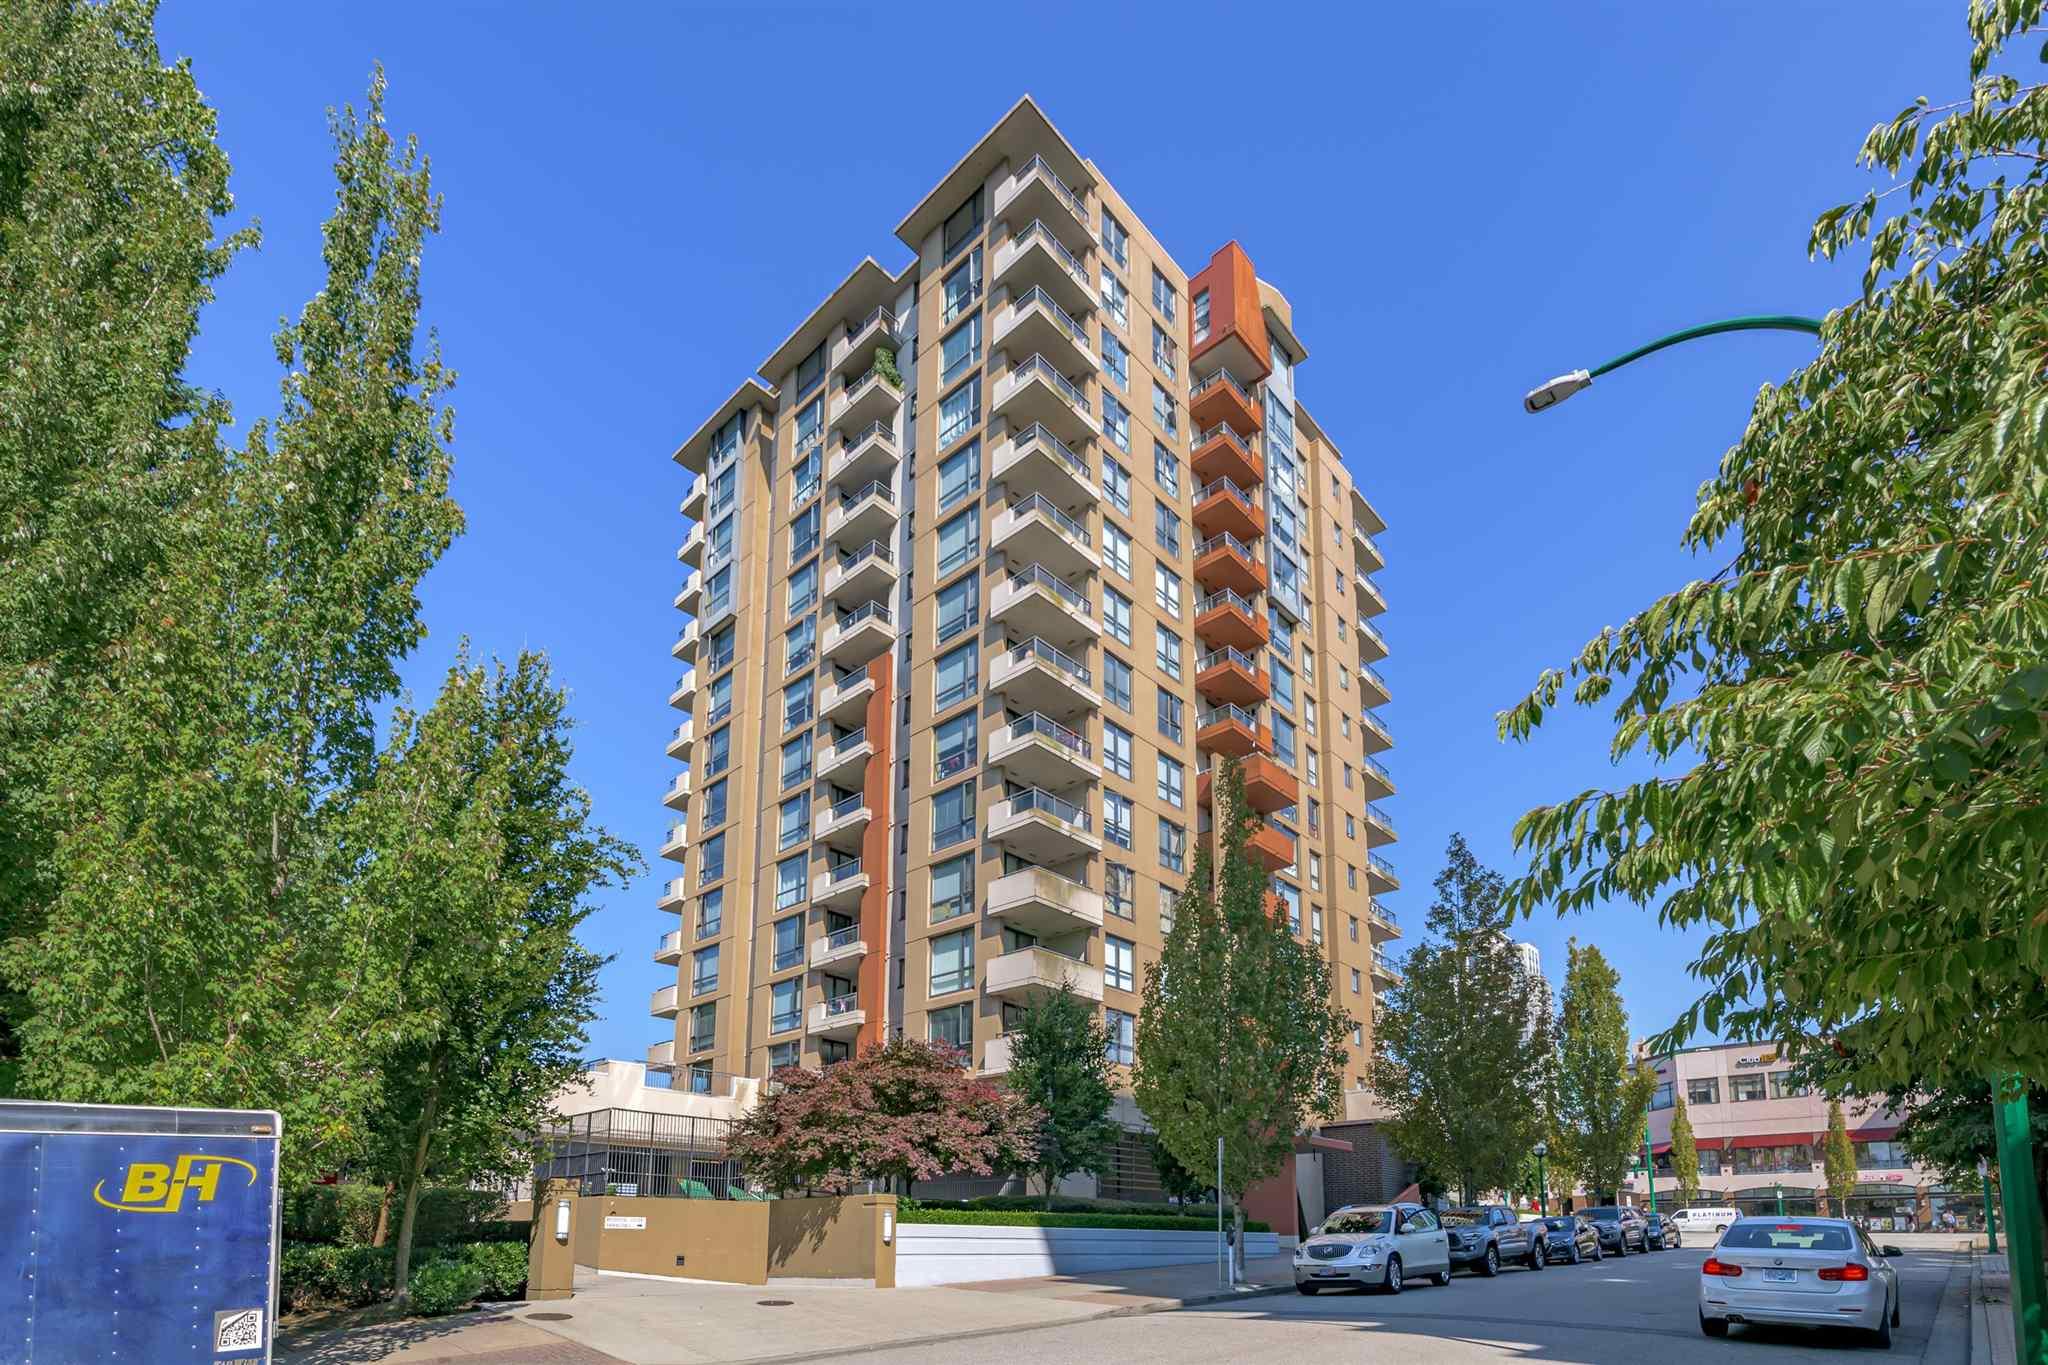 205 7225 ACORN AVENUE - Highgate Apartment/Condo for sale, 2 Bedrooms (R2606454) - #24